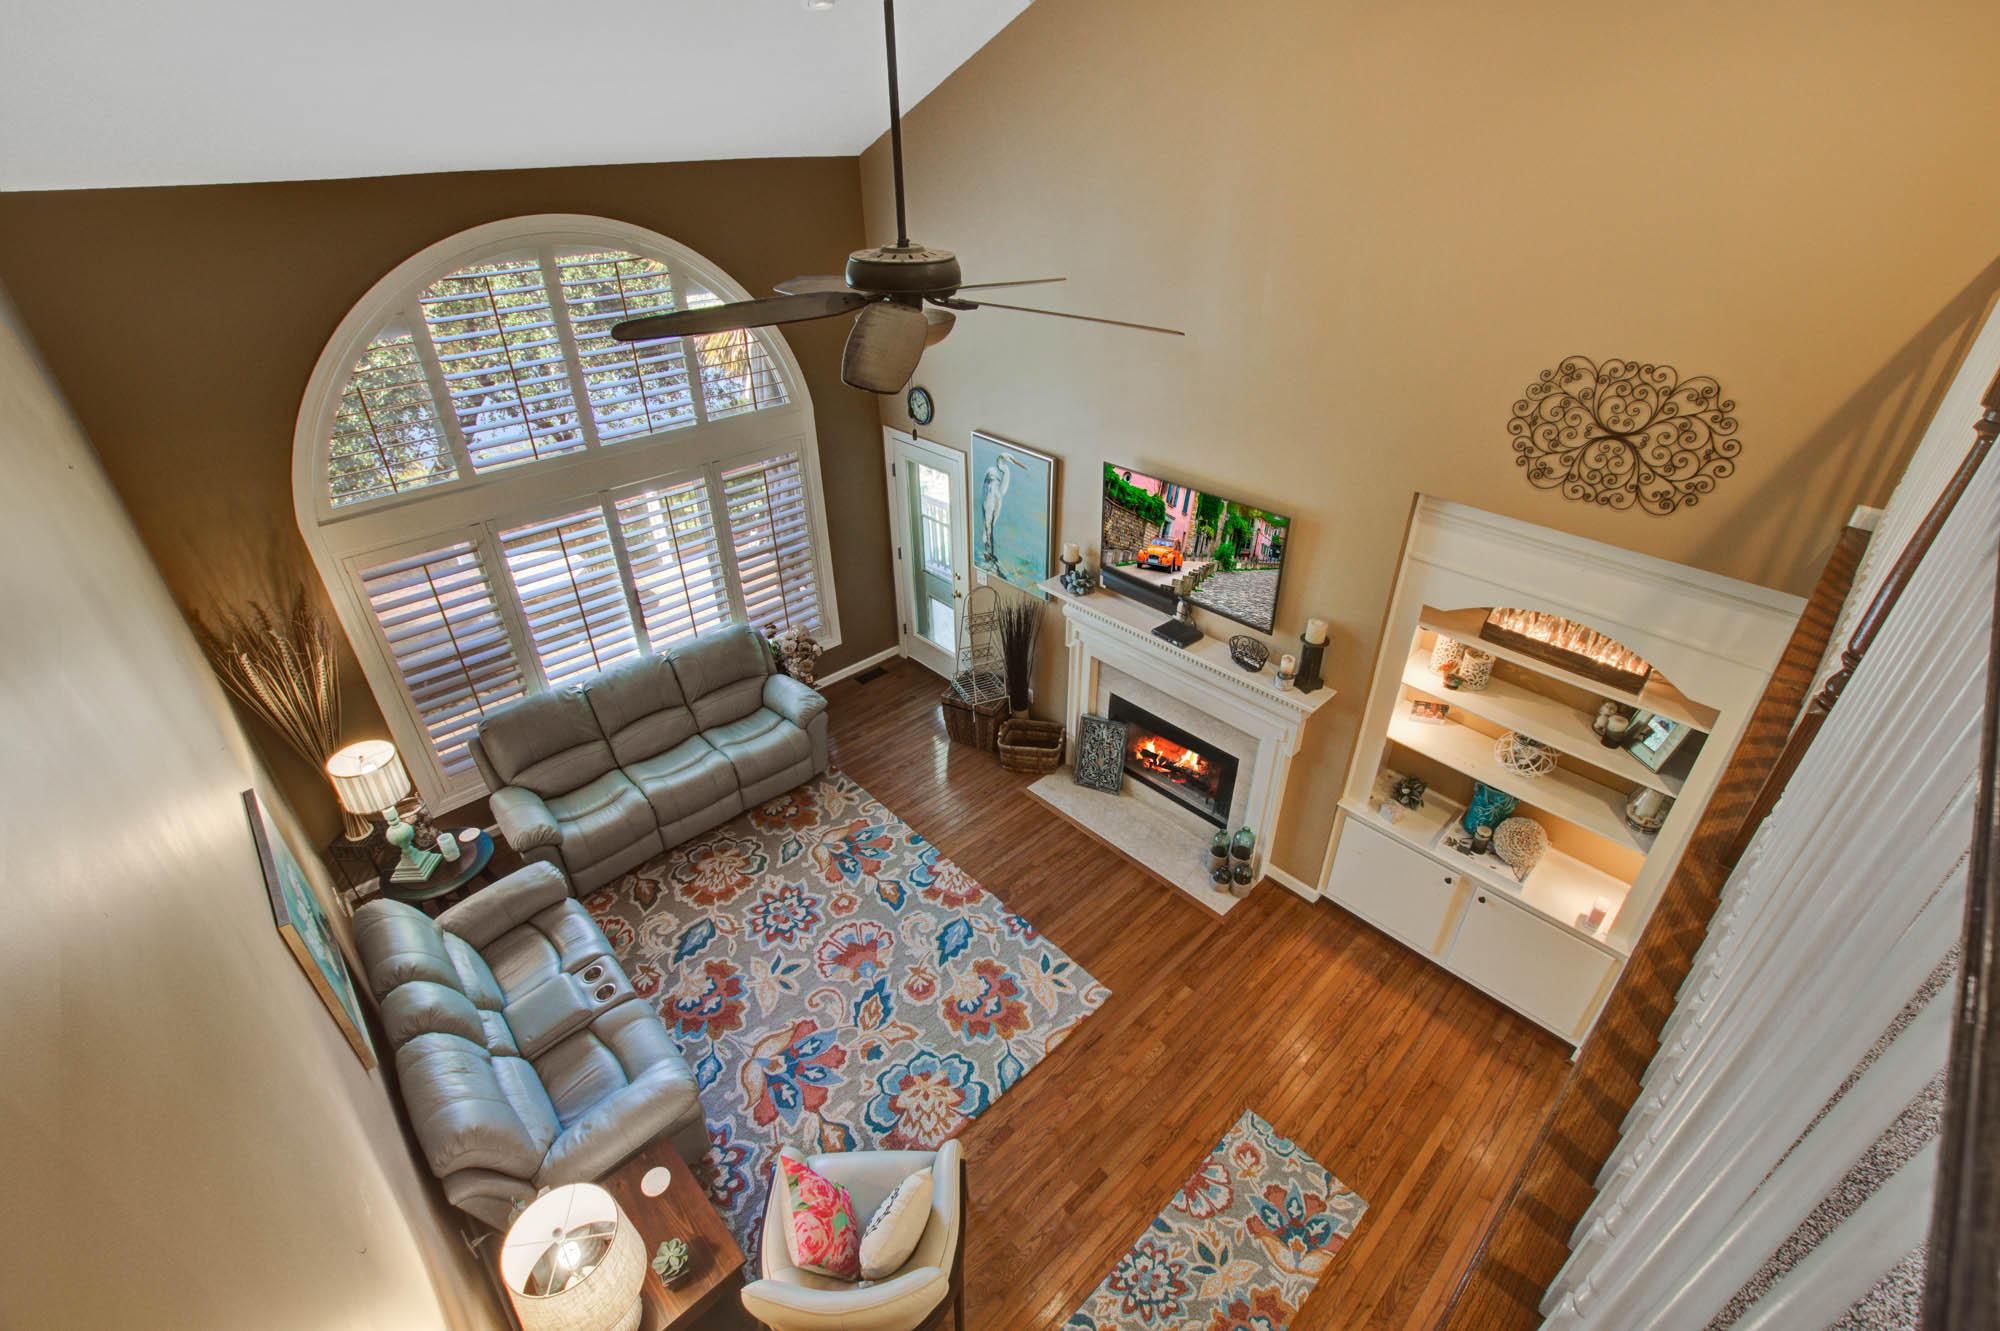 St Thomas Point Homes For Sale - 307 Jamesbury, Charleston, SC - 35